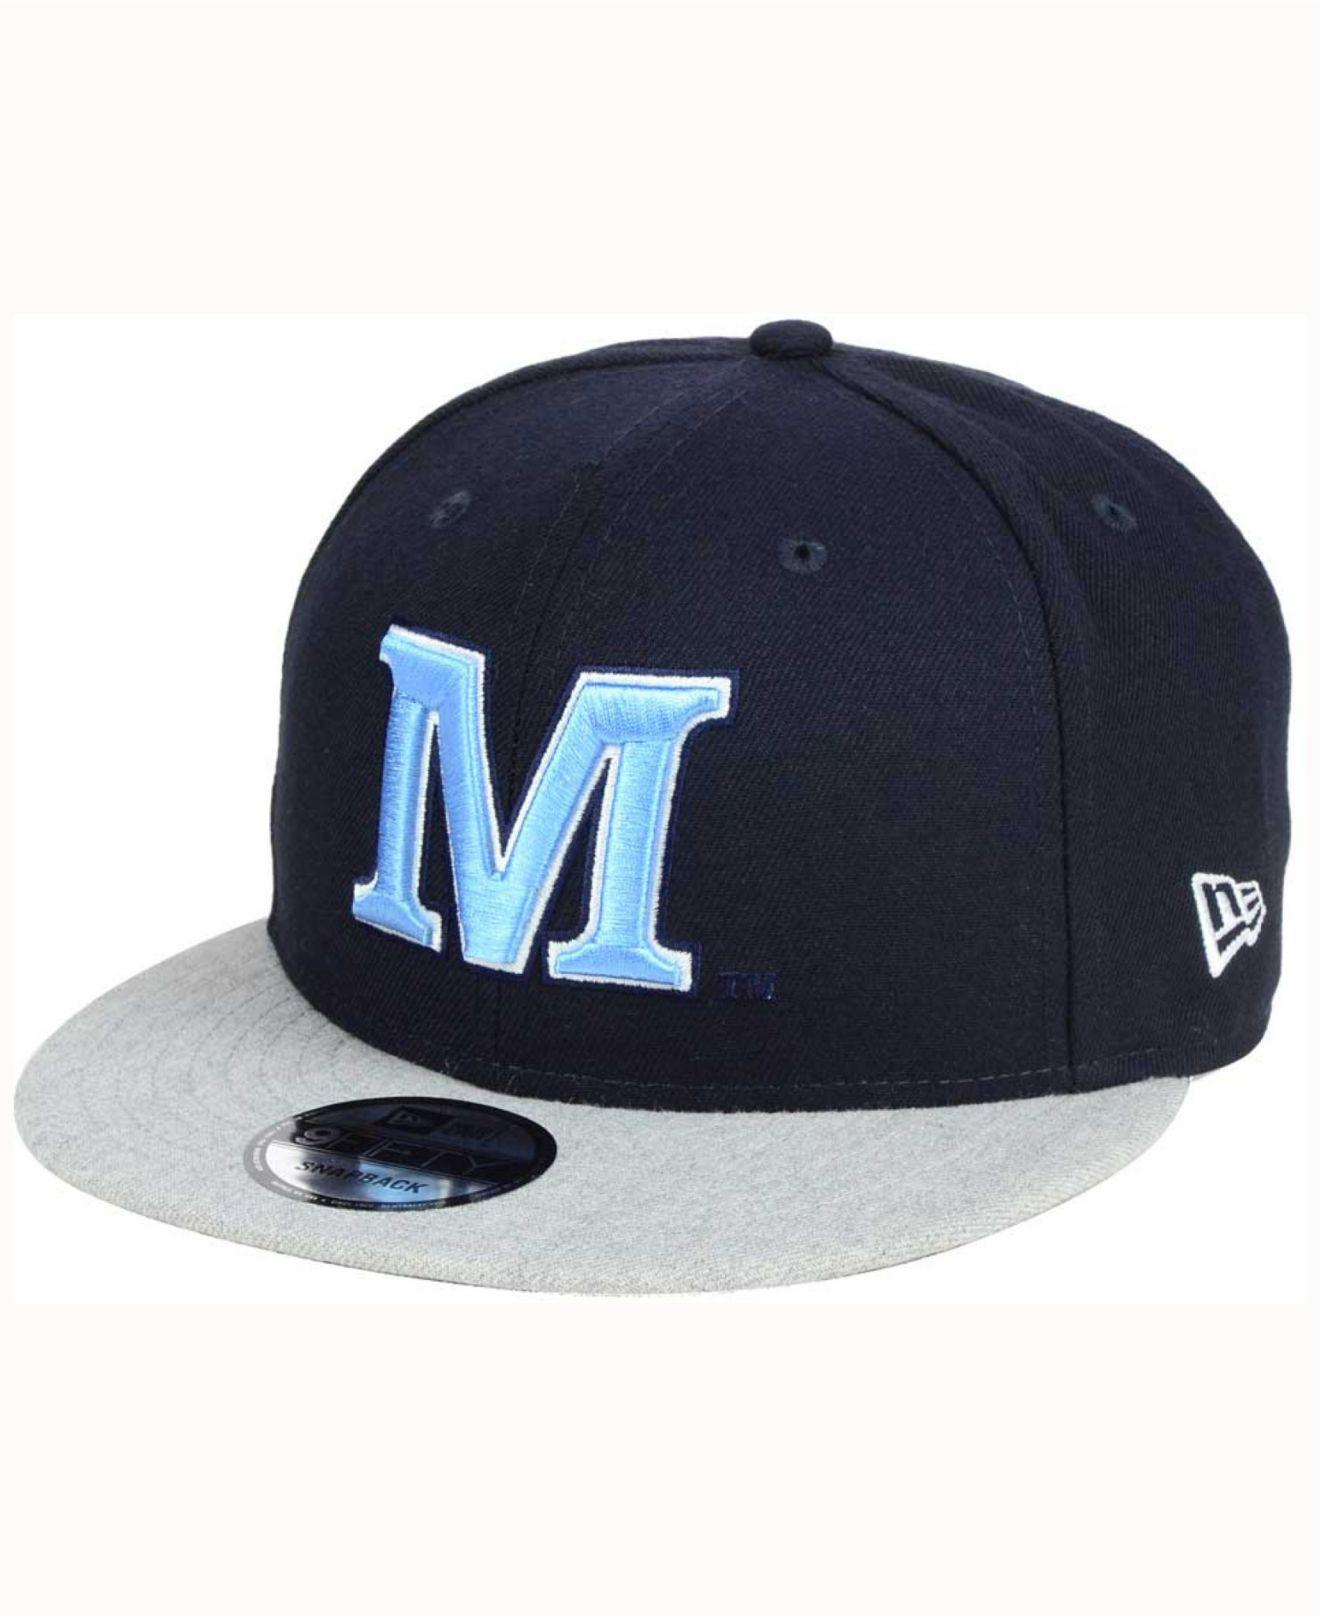 720544acada Lyst - Ktz Mb 9fifty Snapback Cap in Blue for Men